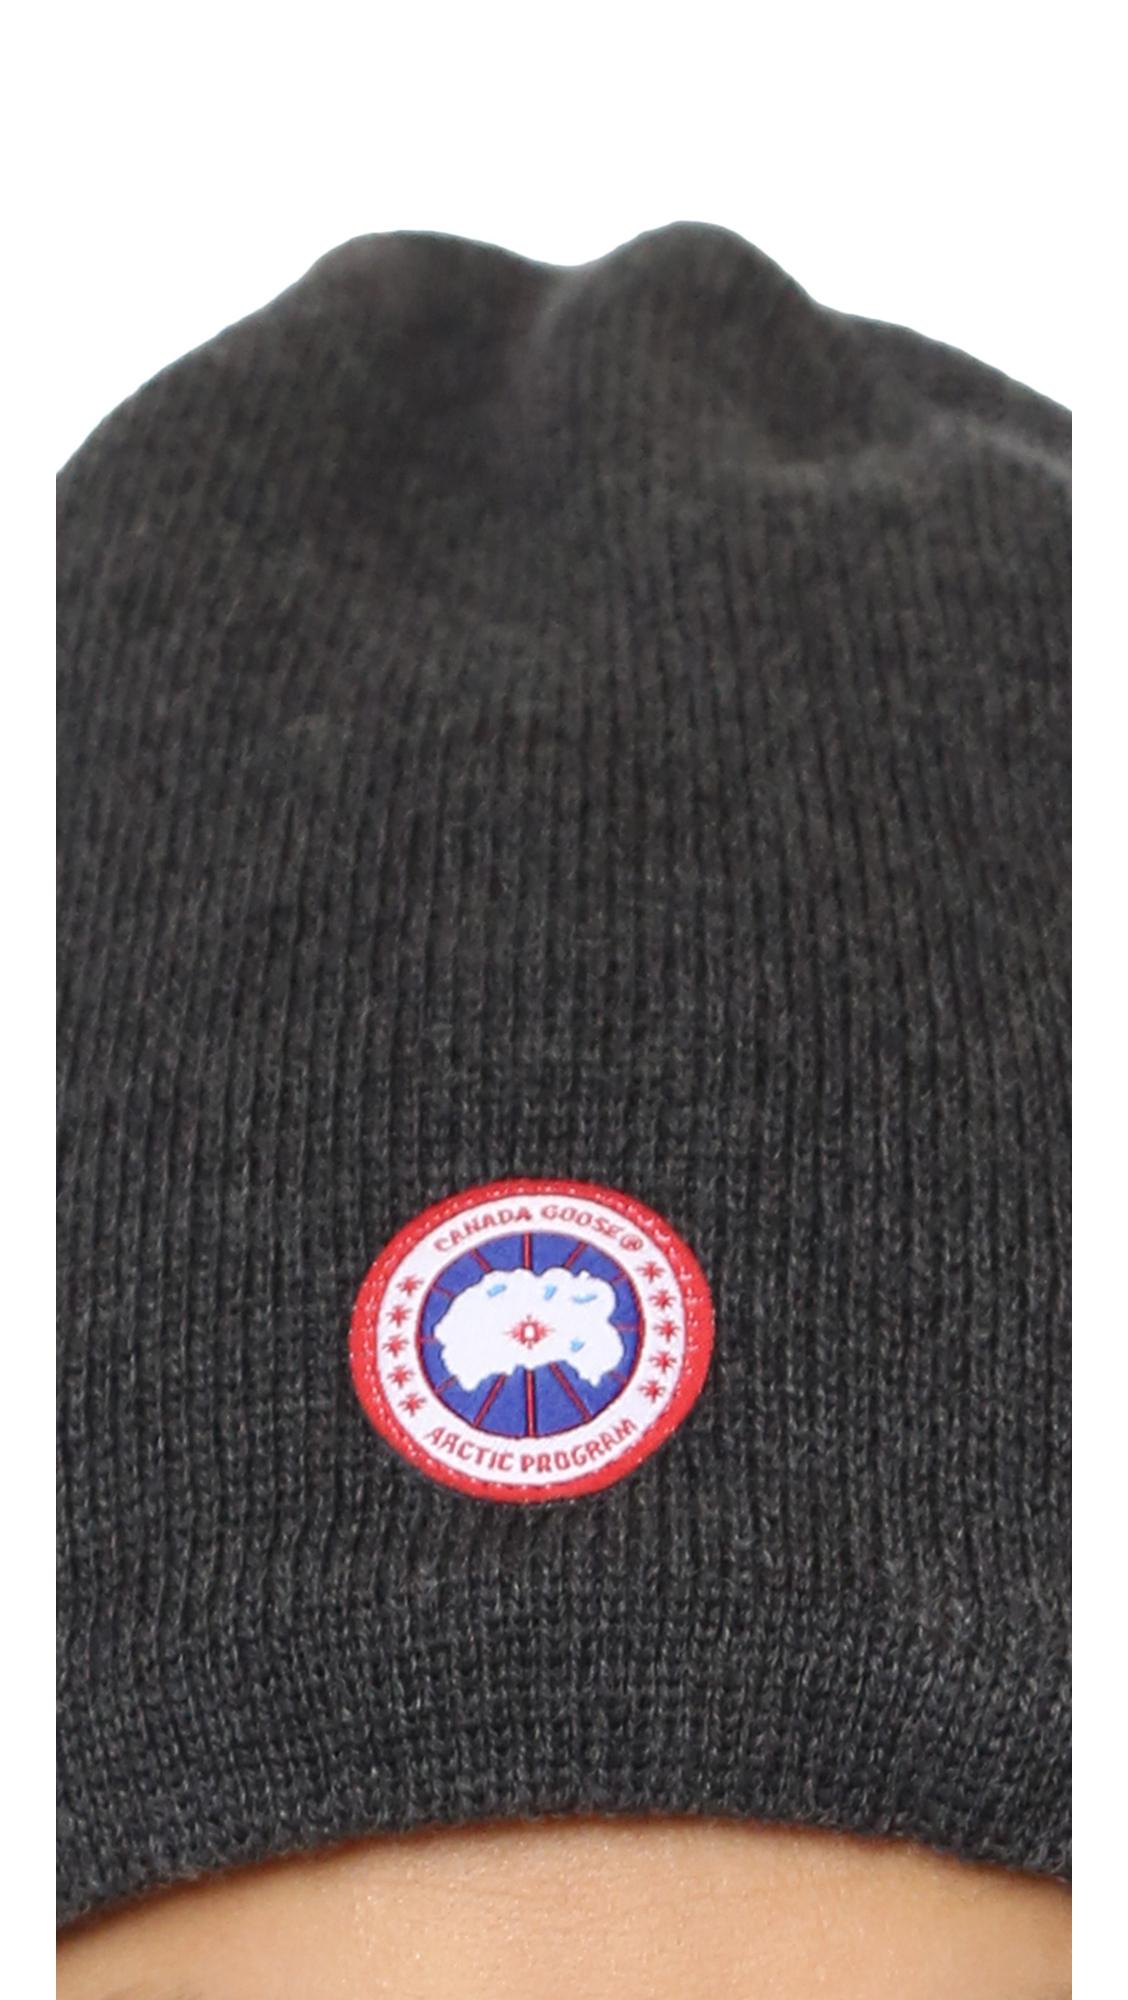 Canada Goose' Merino Wool Logo Printed Pom Hat